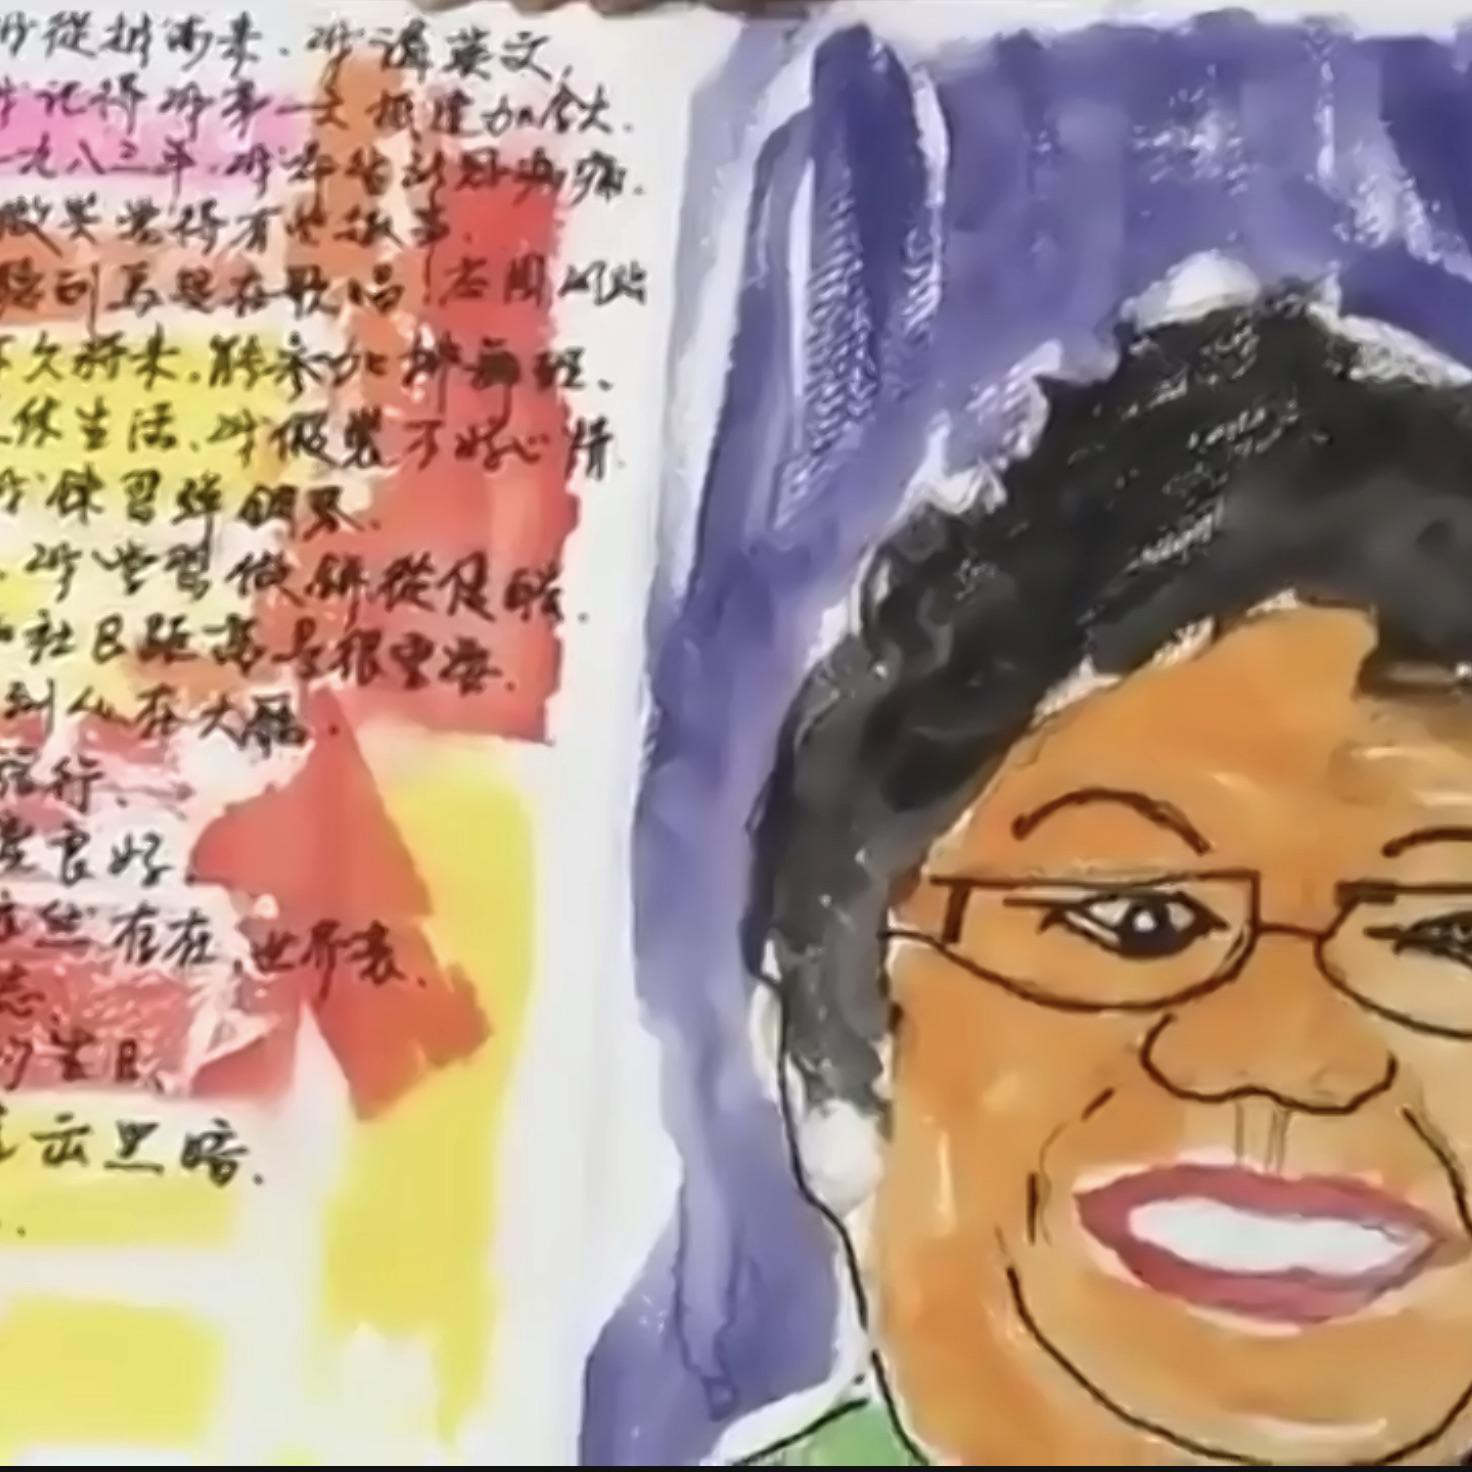 18.Kim-with-writing